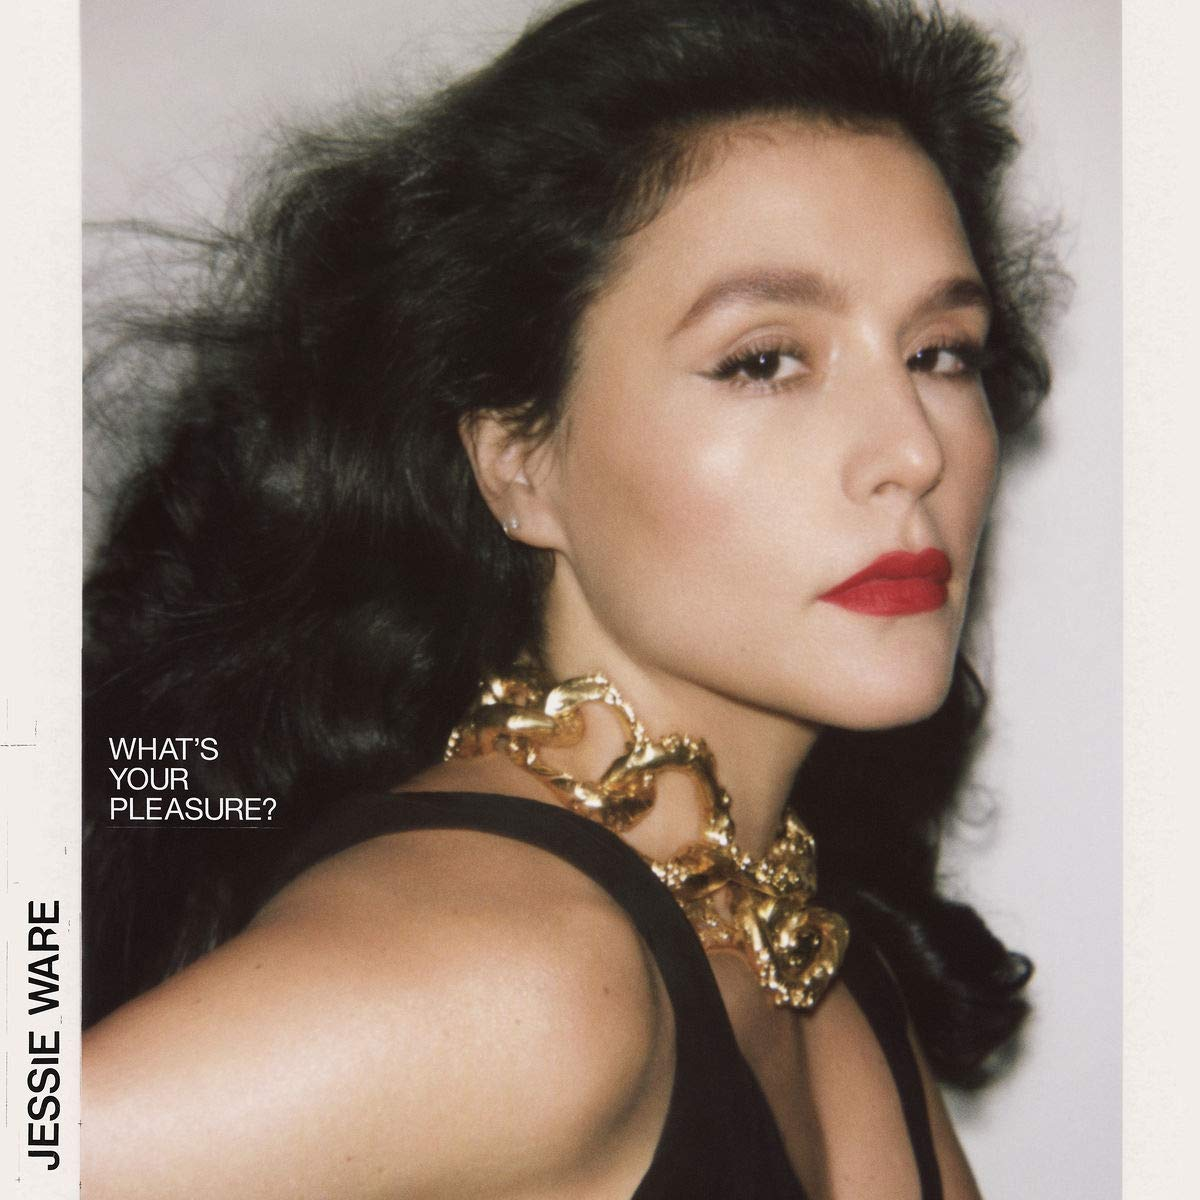 Jessie Ware - What's Your Pleasure? - Amazon.com Music